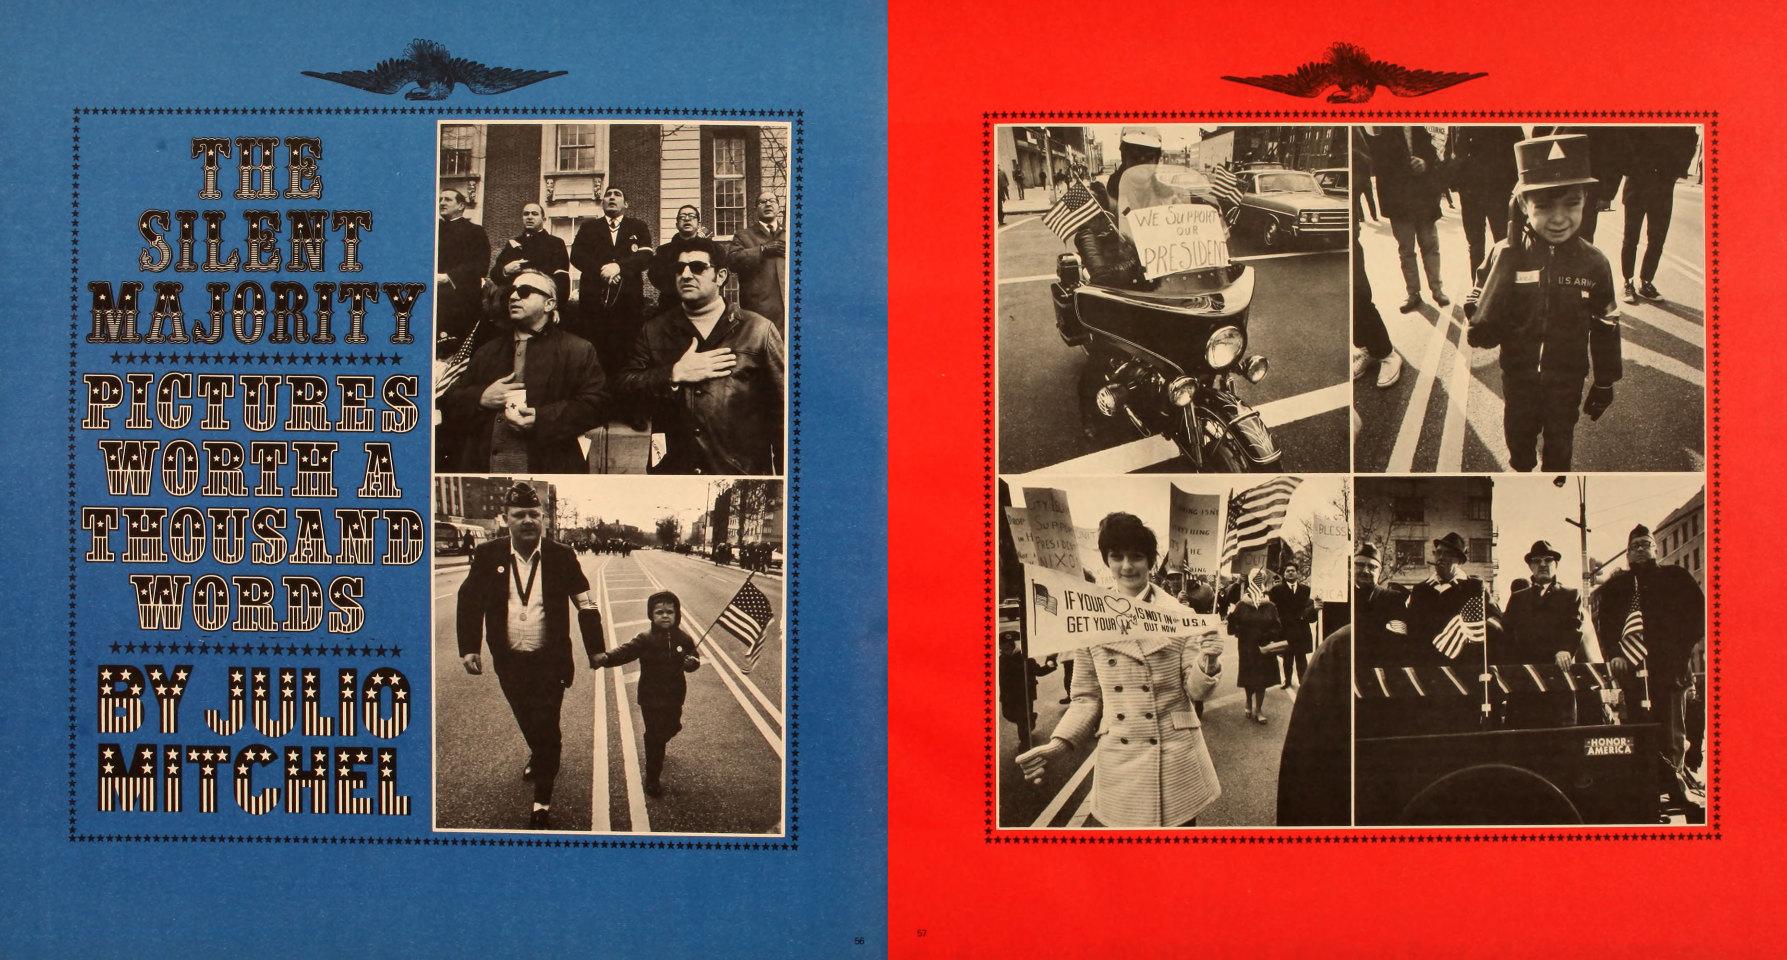 avant-garde-magazine-26